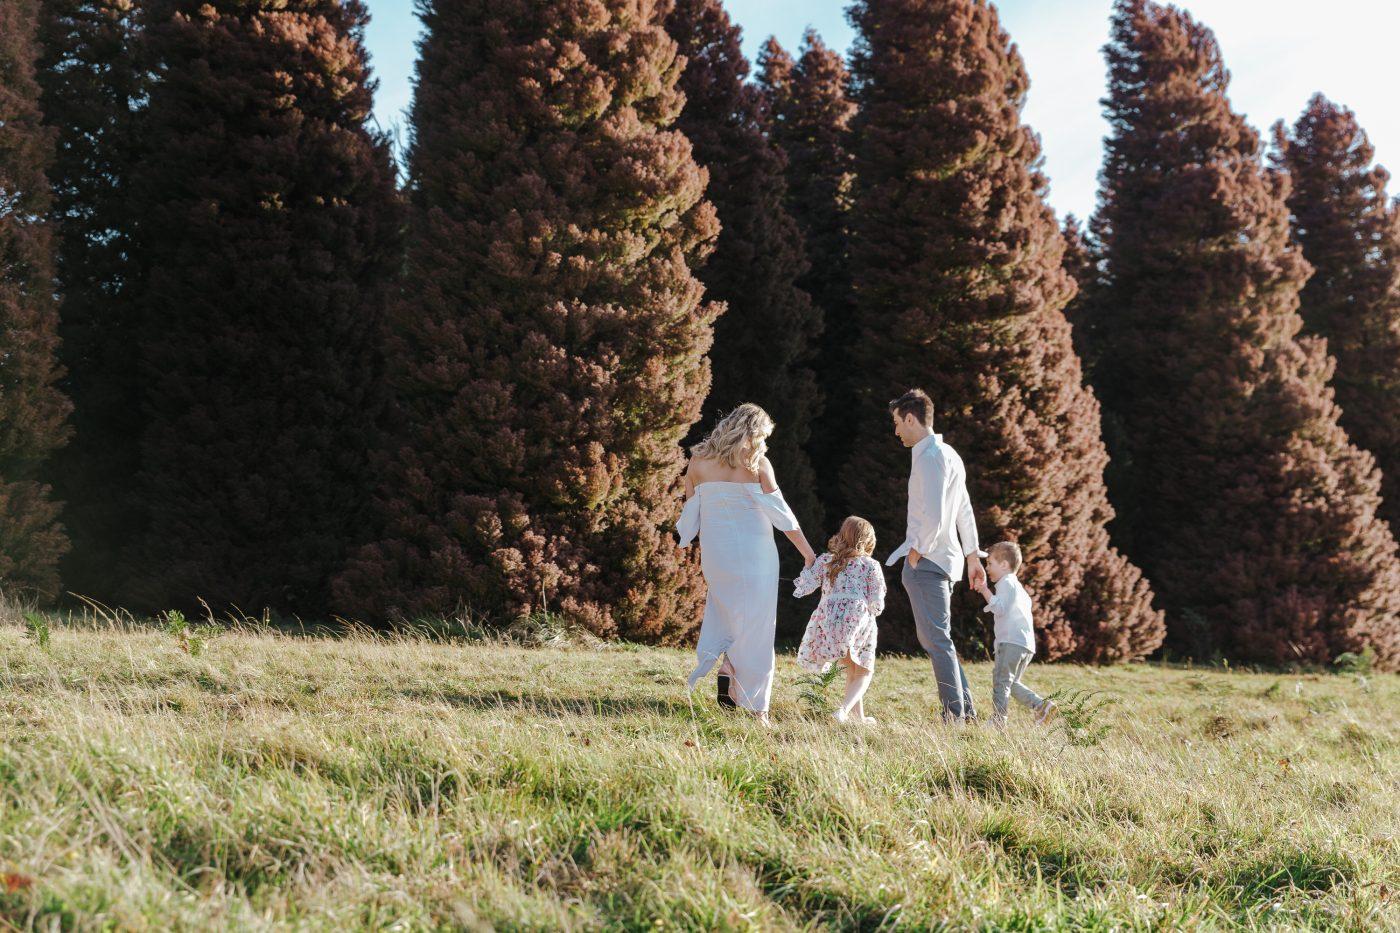 Photoshoot-Families-AlexanderFamily